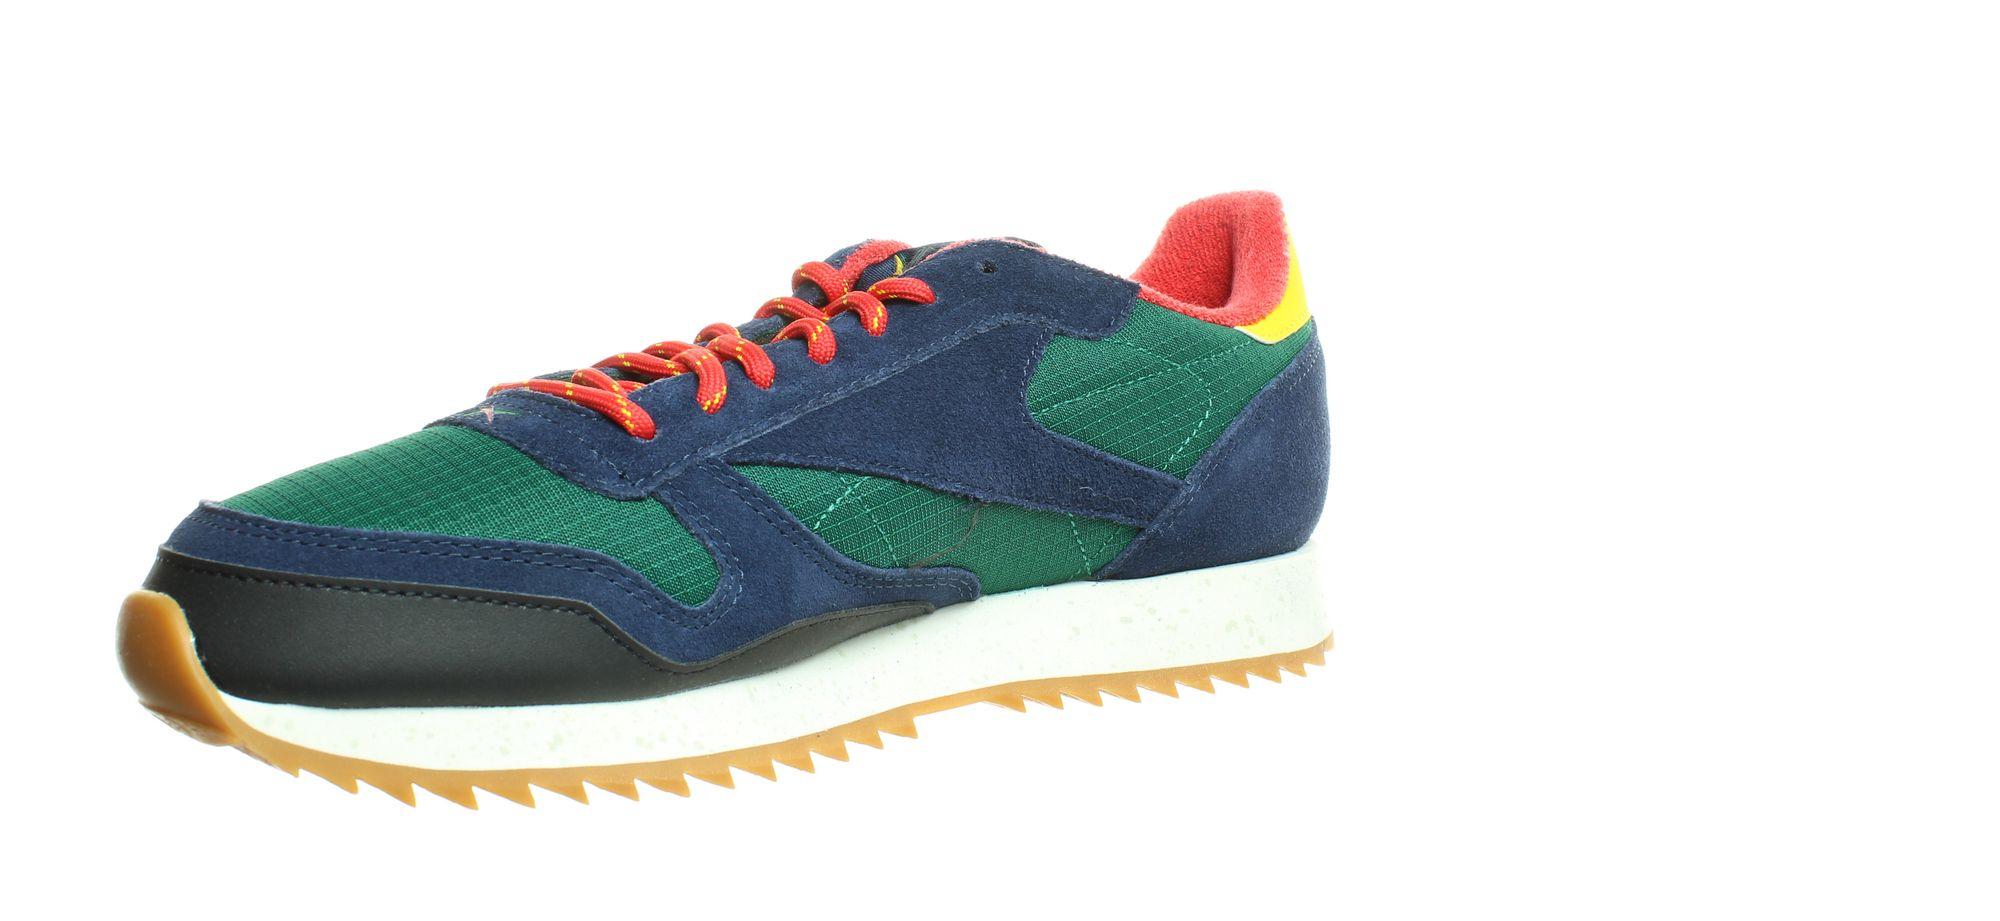 Reebok-Mens-Classic-Leather-Ripple-Fashion-Sneakers thumbnail 15